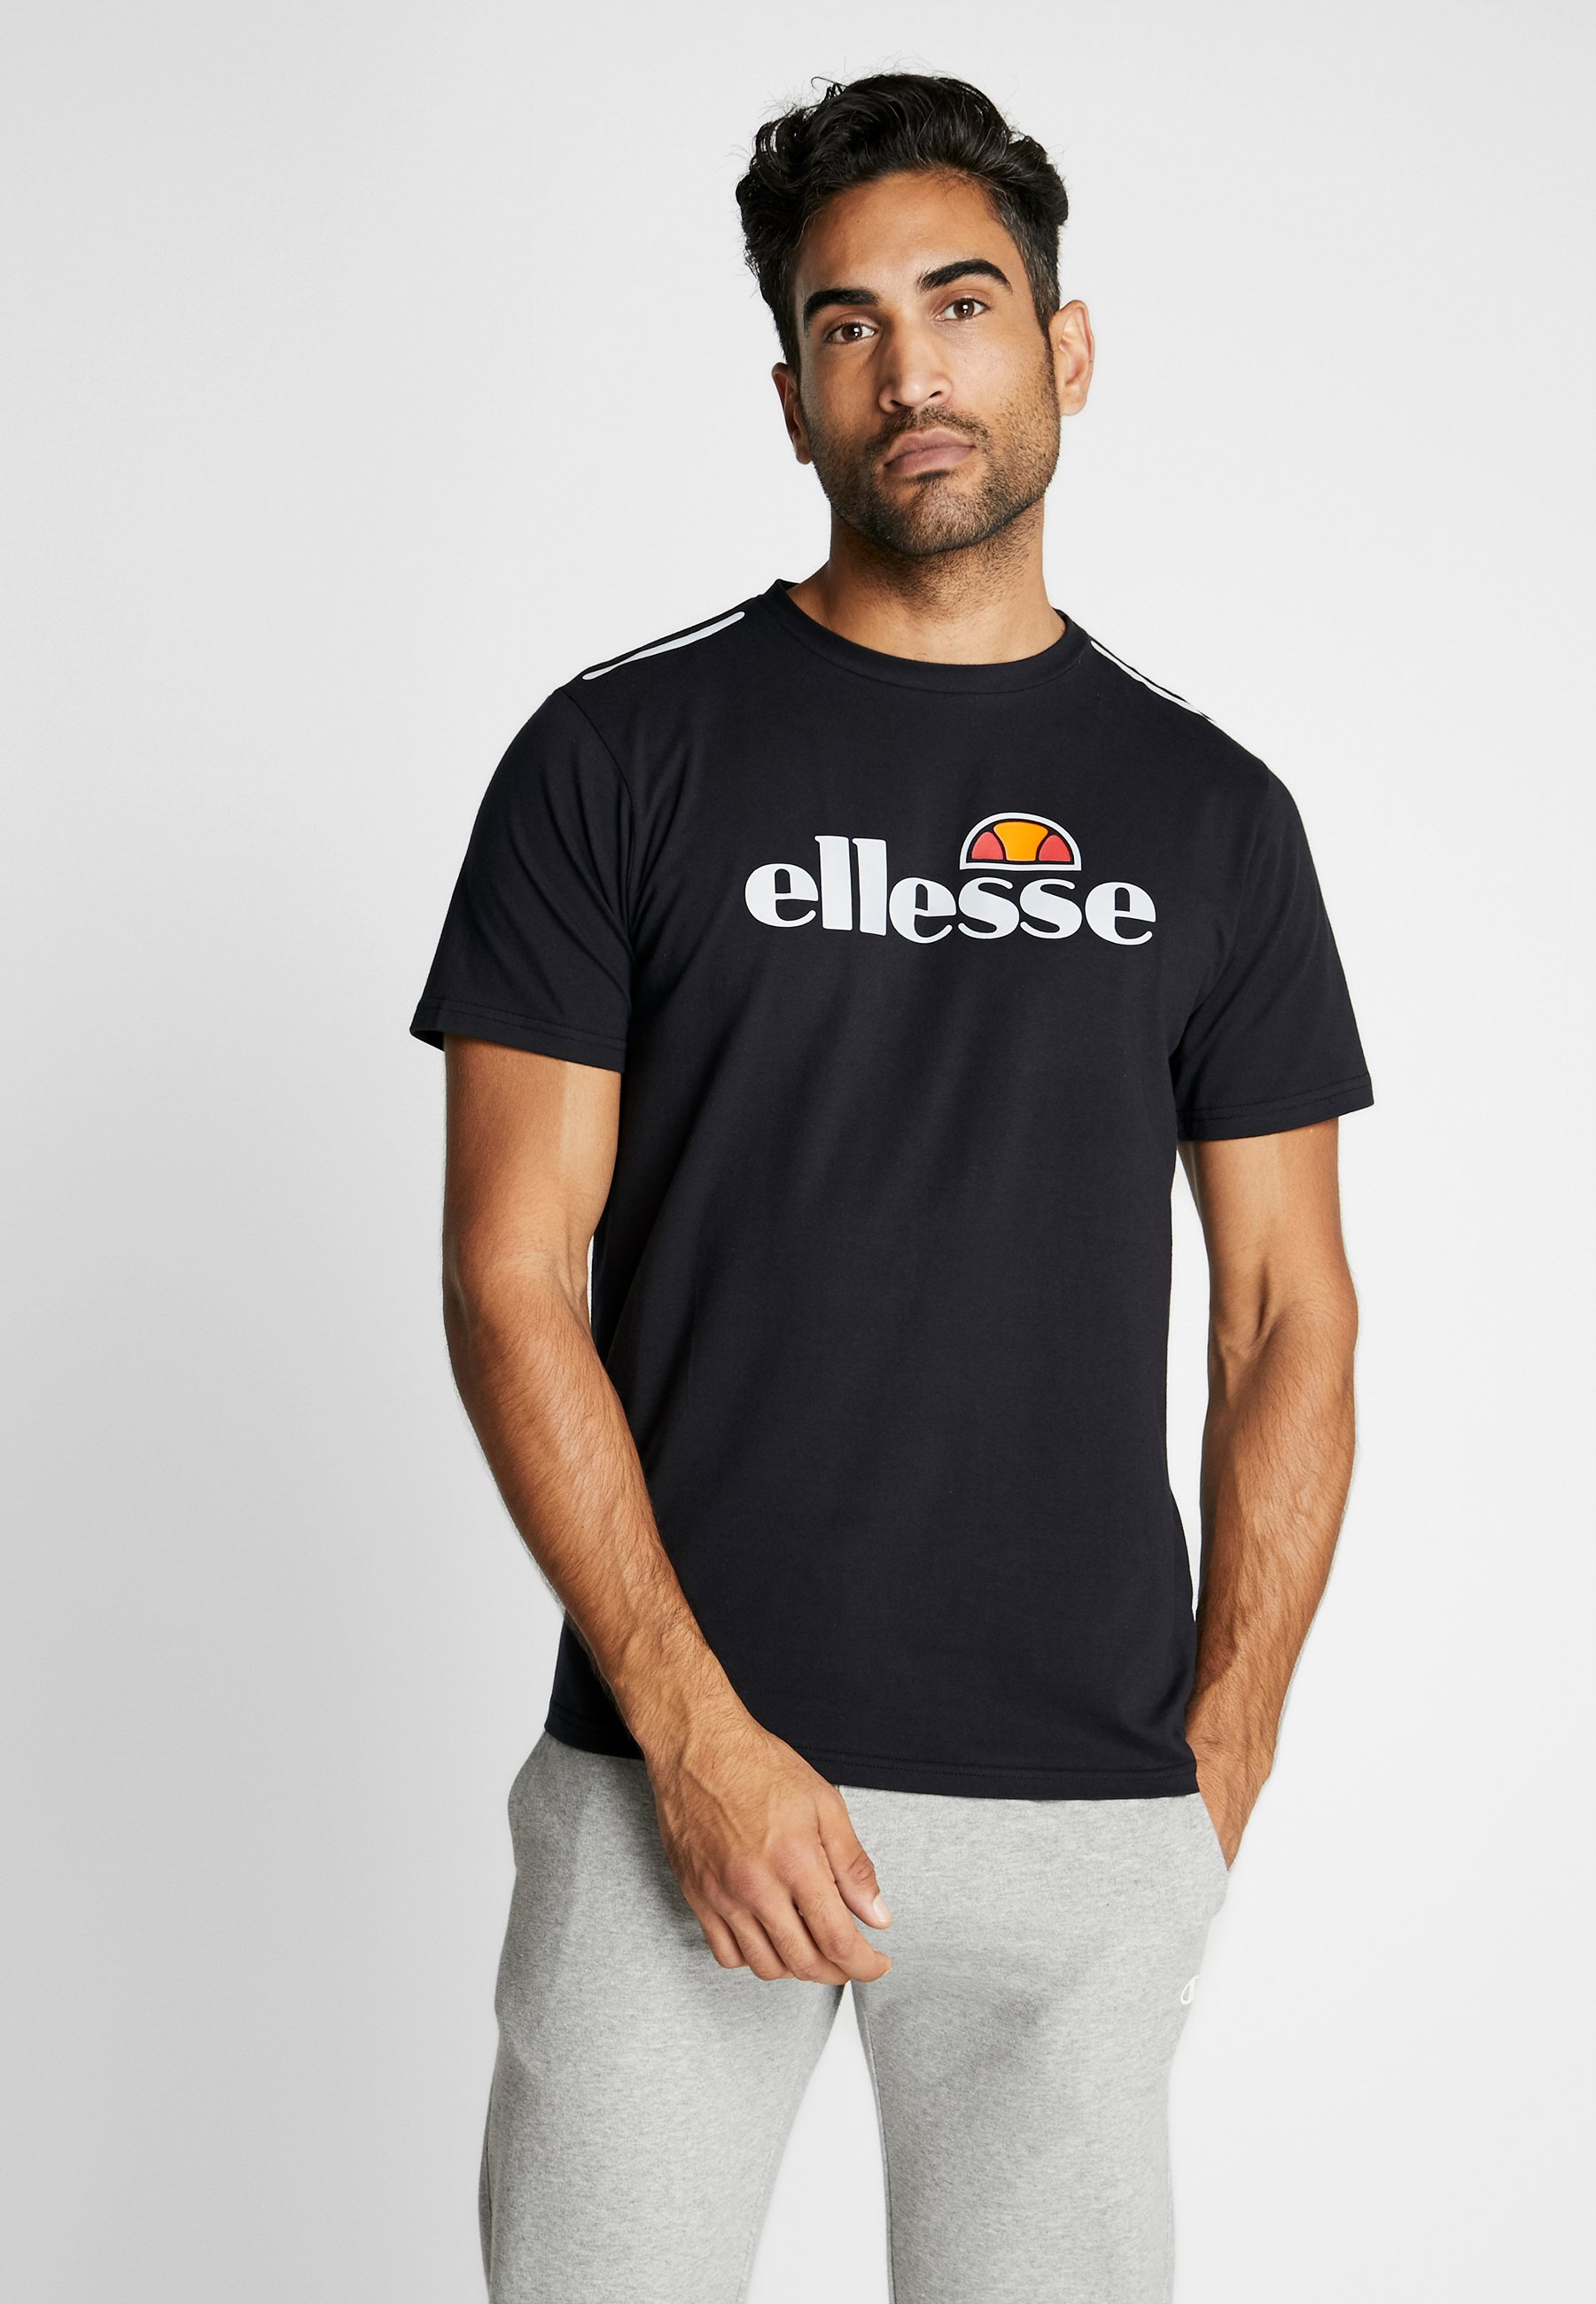 Ellesse Stampa Con CellaT shirt Black DbHIYWE29e